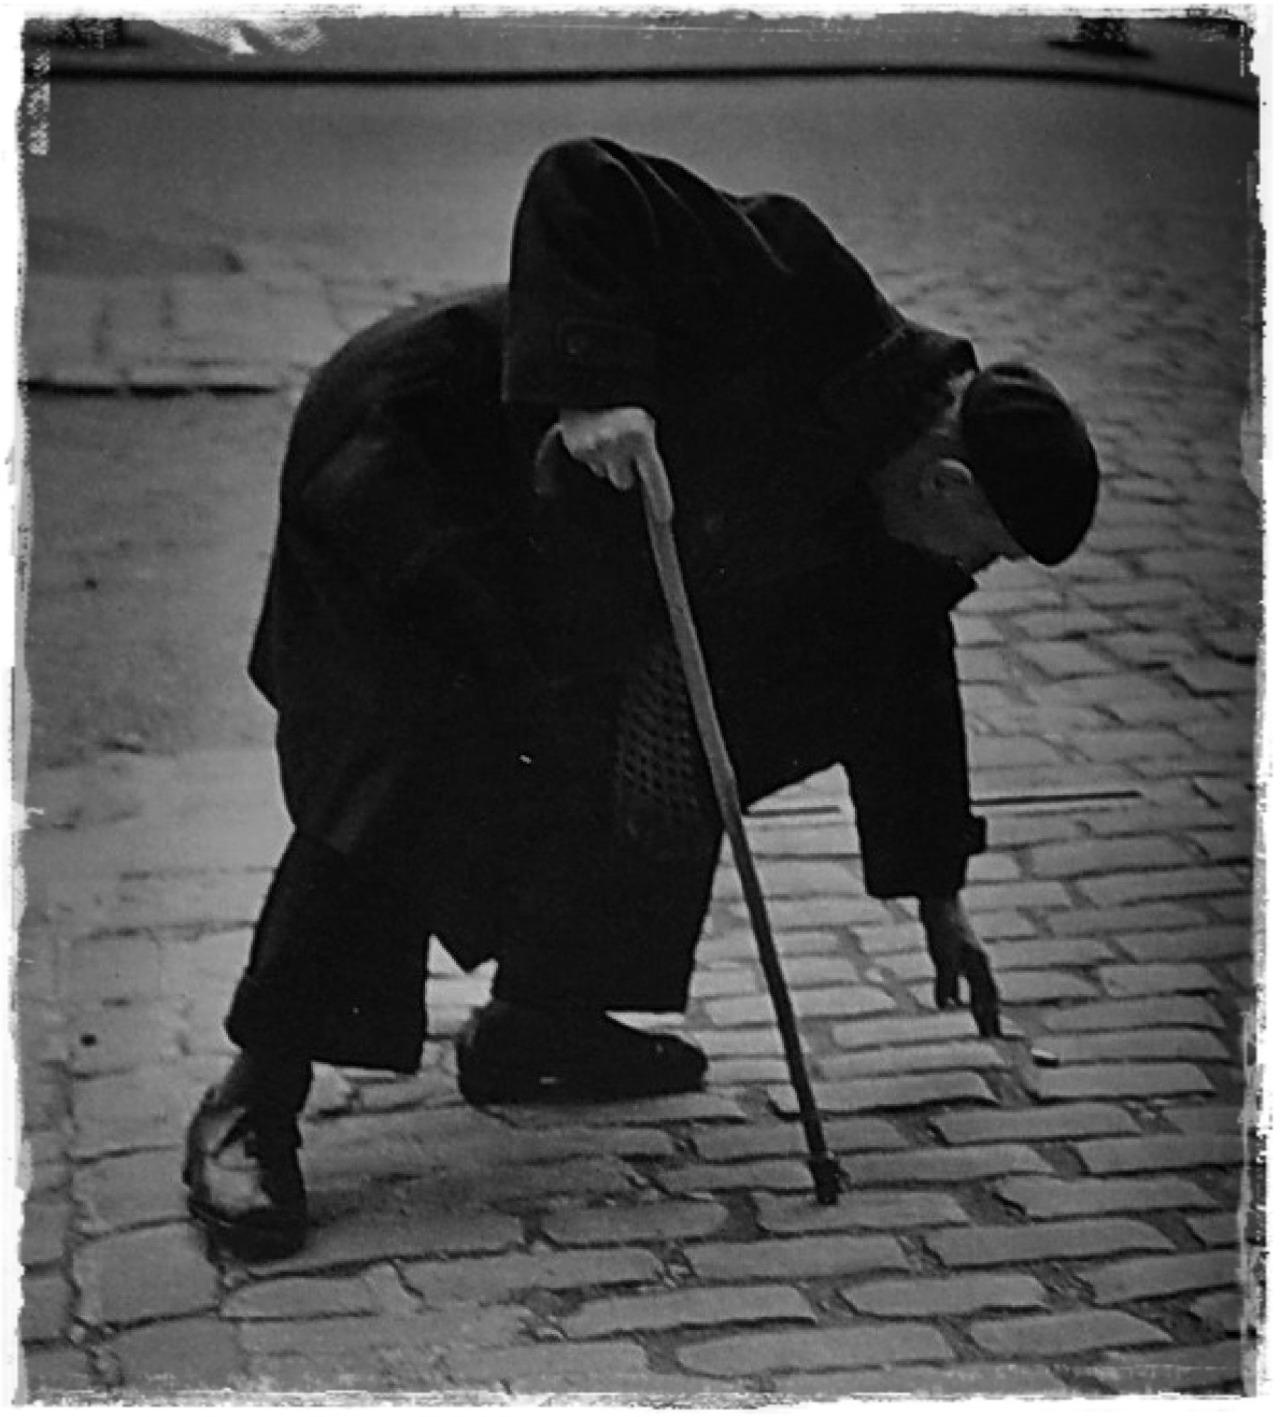 de-salva:  From the book  OKÄNTPARIS / Tore Johnson (photos),Ivar Lo-Johansson (text)  * Stockholm (1954)